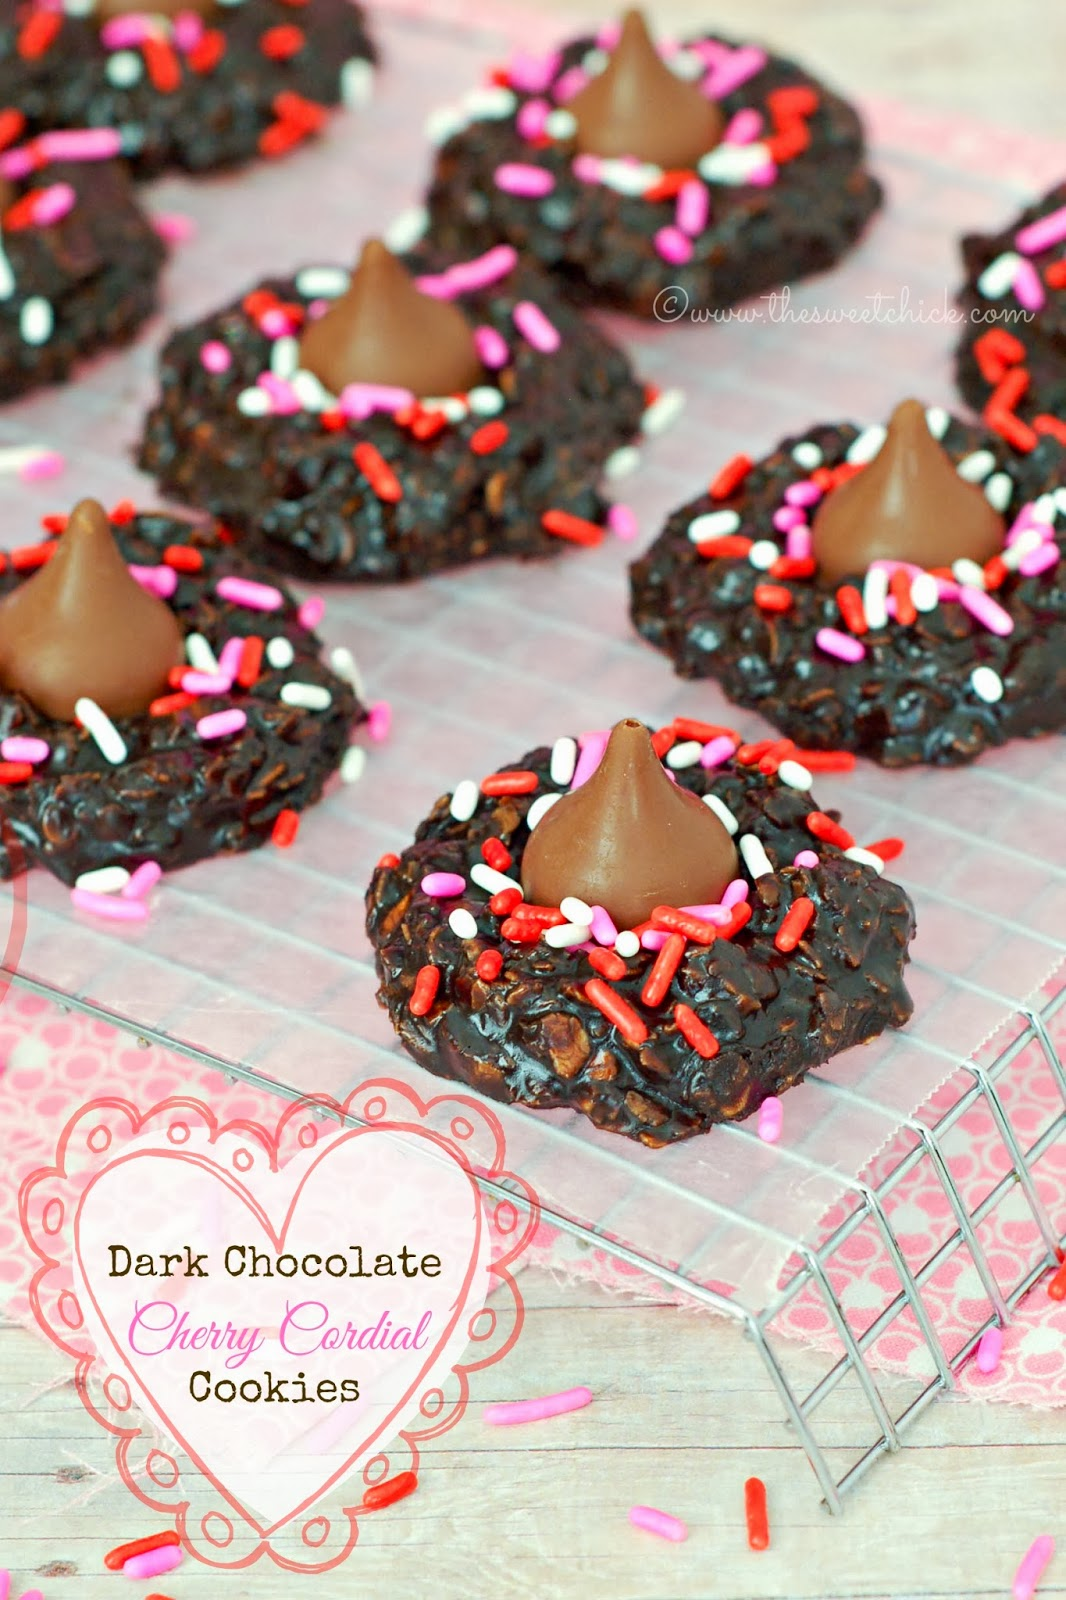 Dark Chocolate Cherry Cordial Cookies